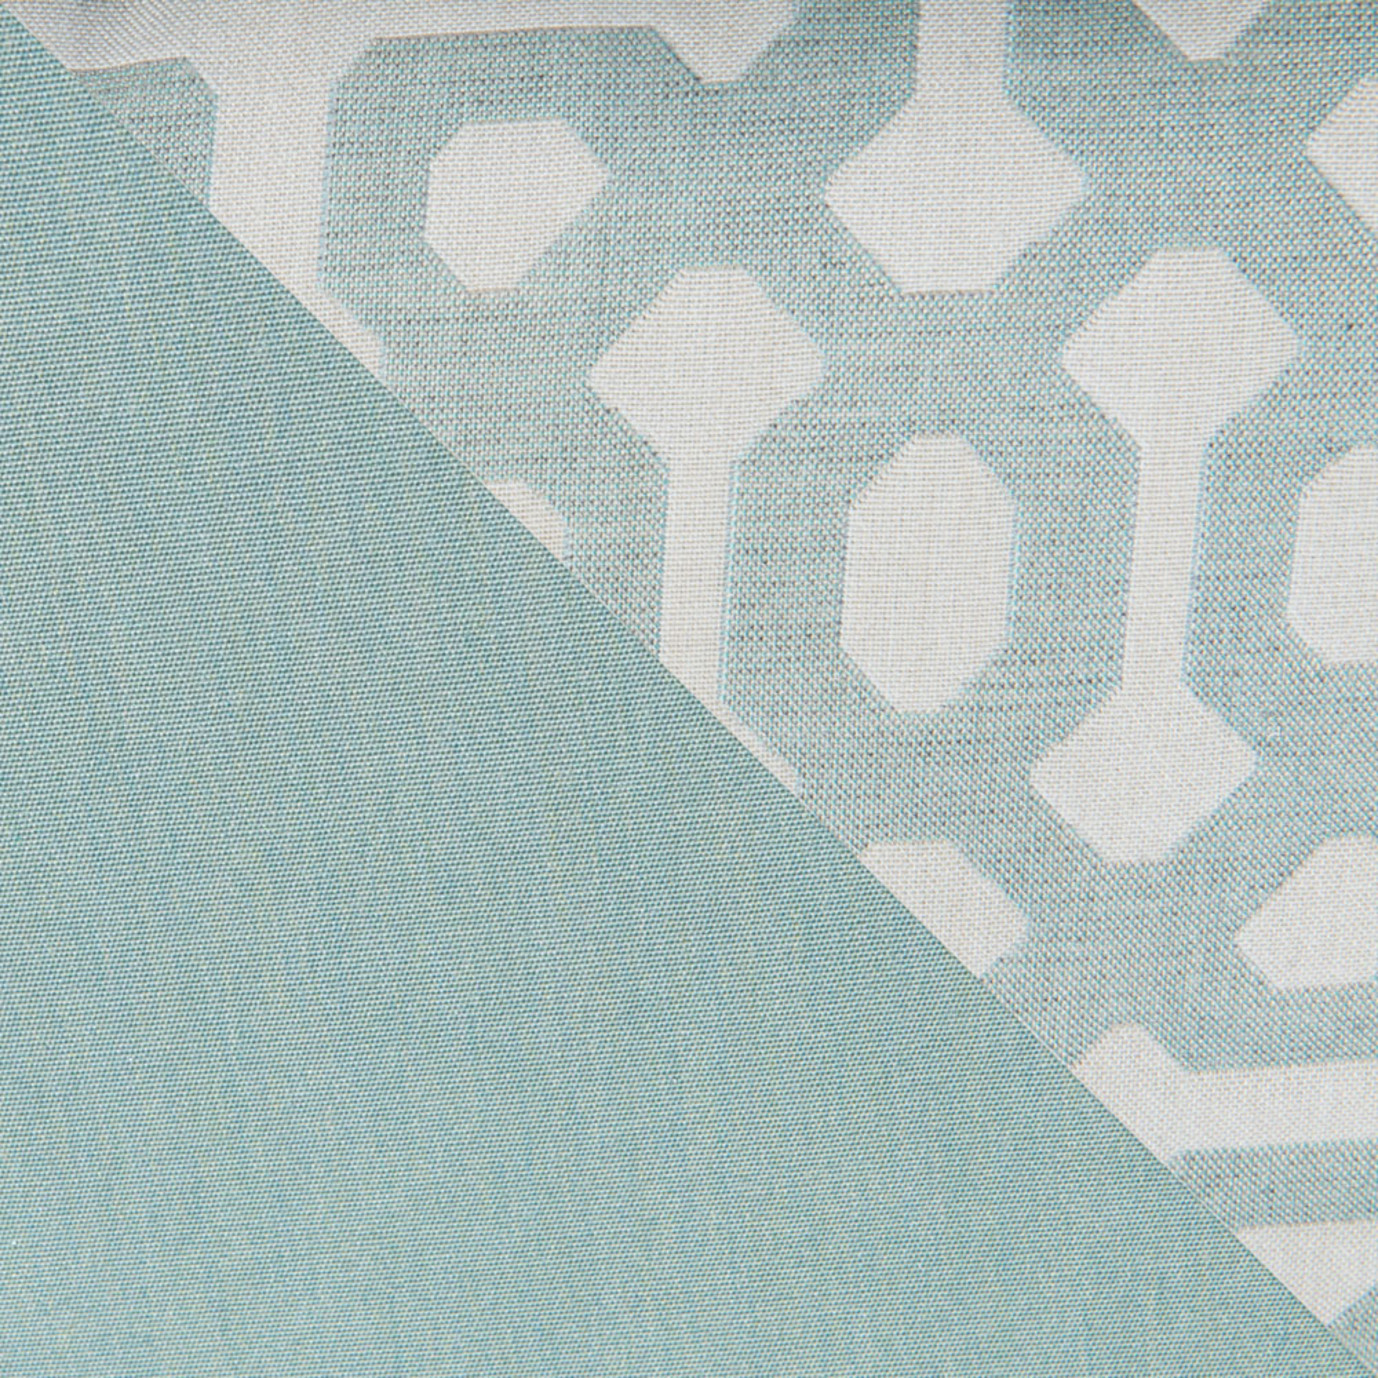 Deco™ Deluxe 5pc Motion Club & Ottoman Set - Spa Blue